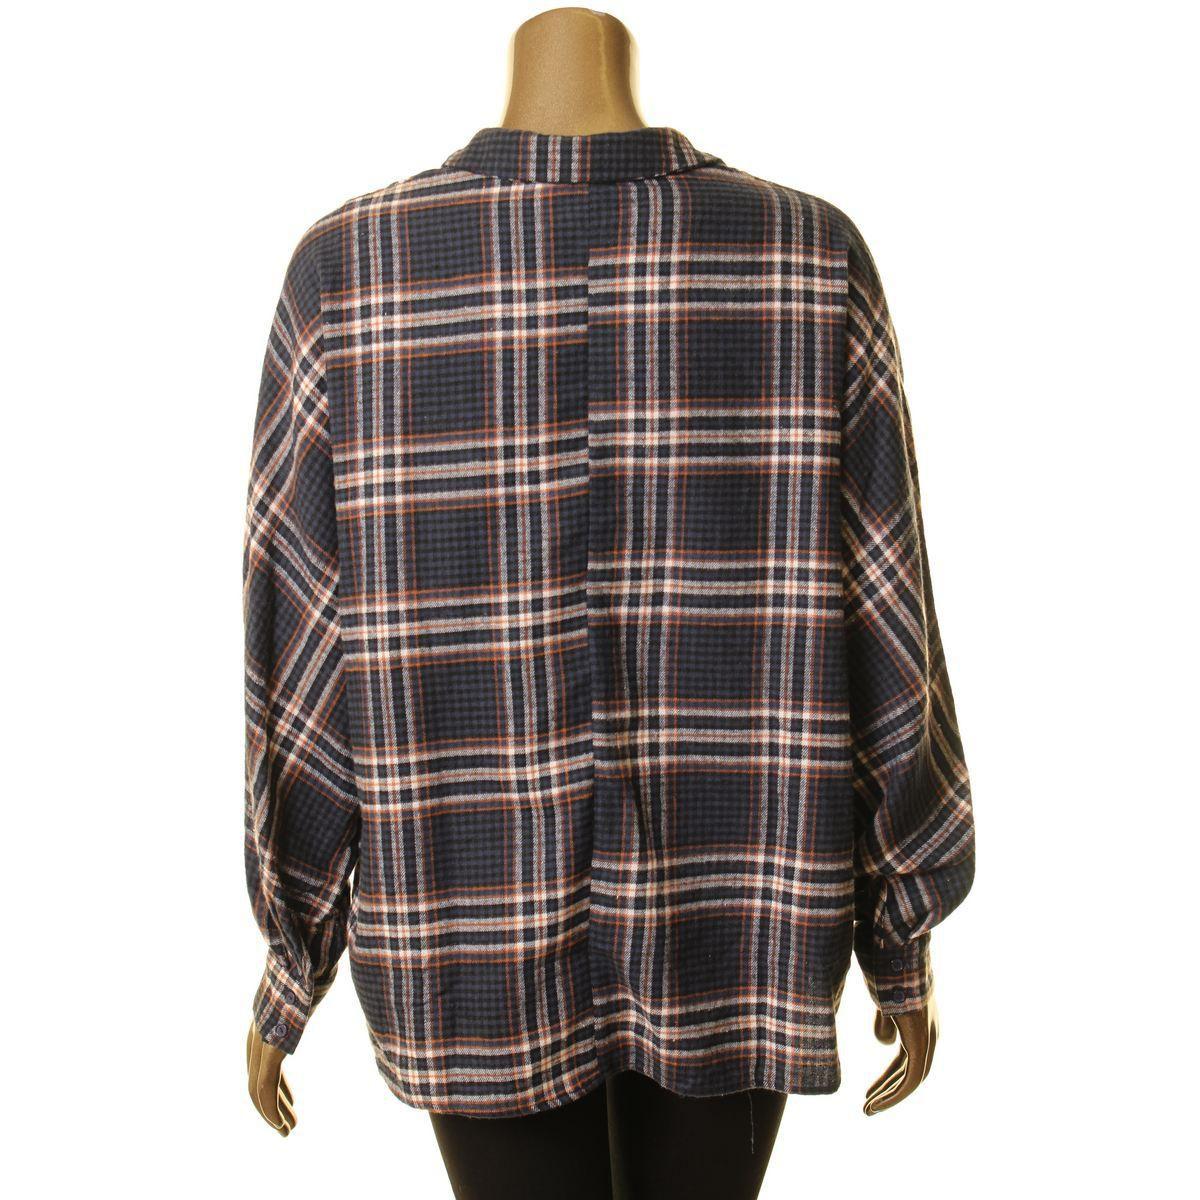 LUSH Women's Check Blouse Shirt Top Navy/rust Size M